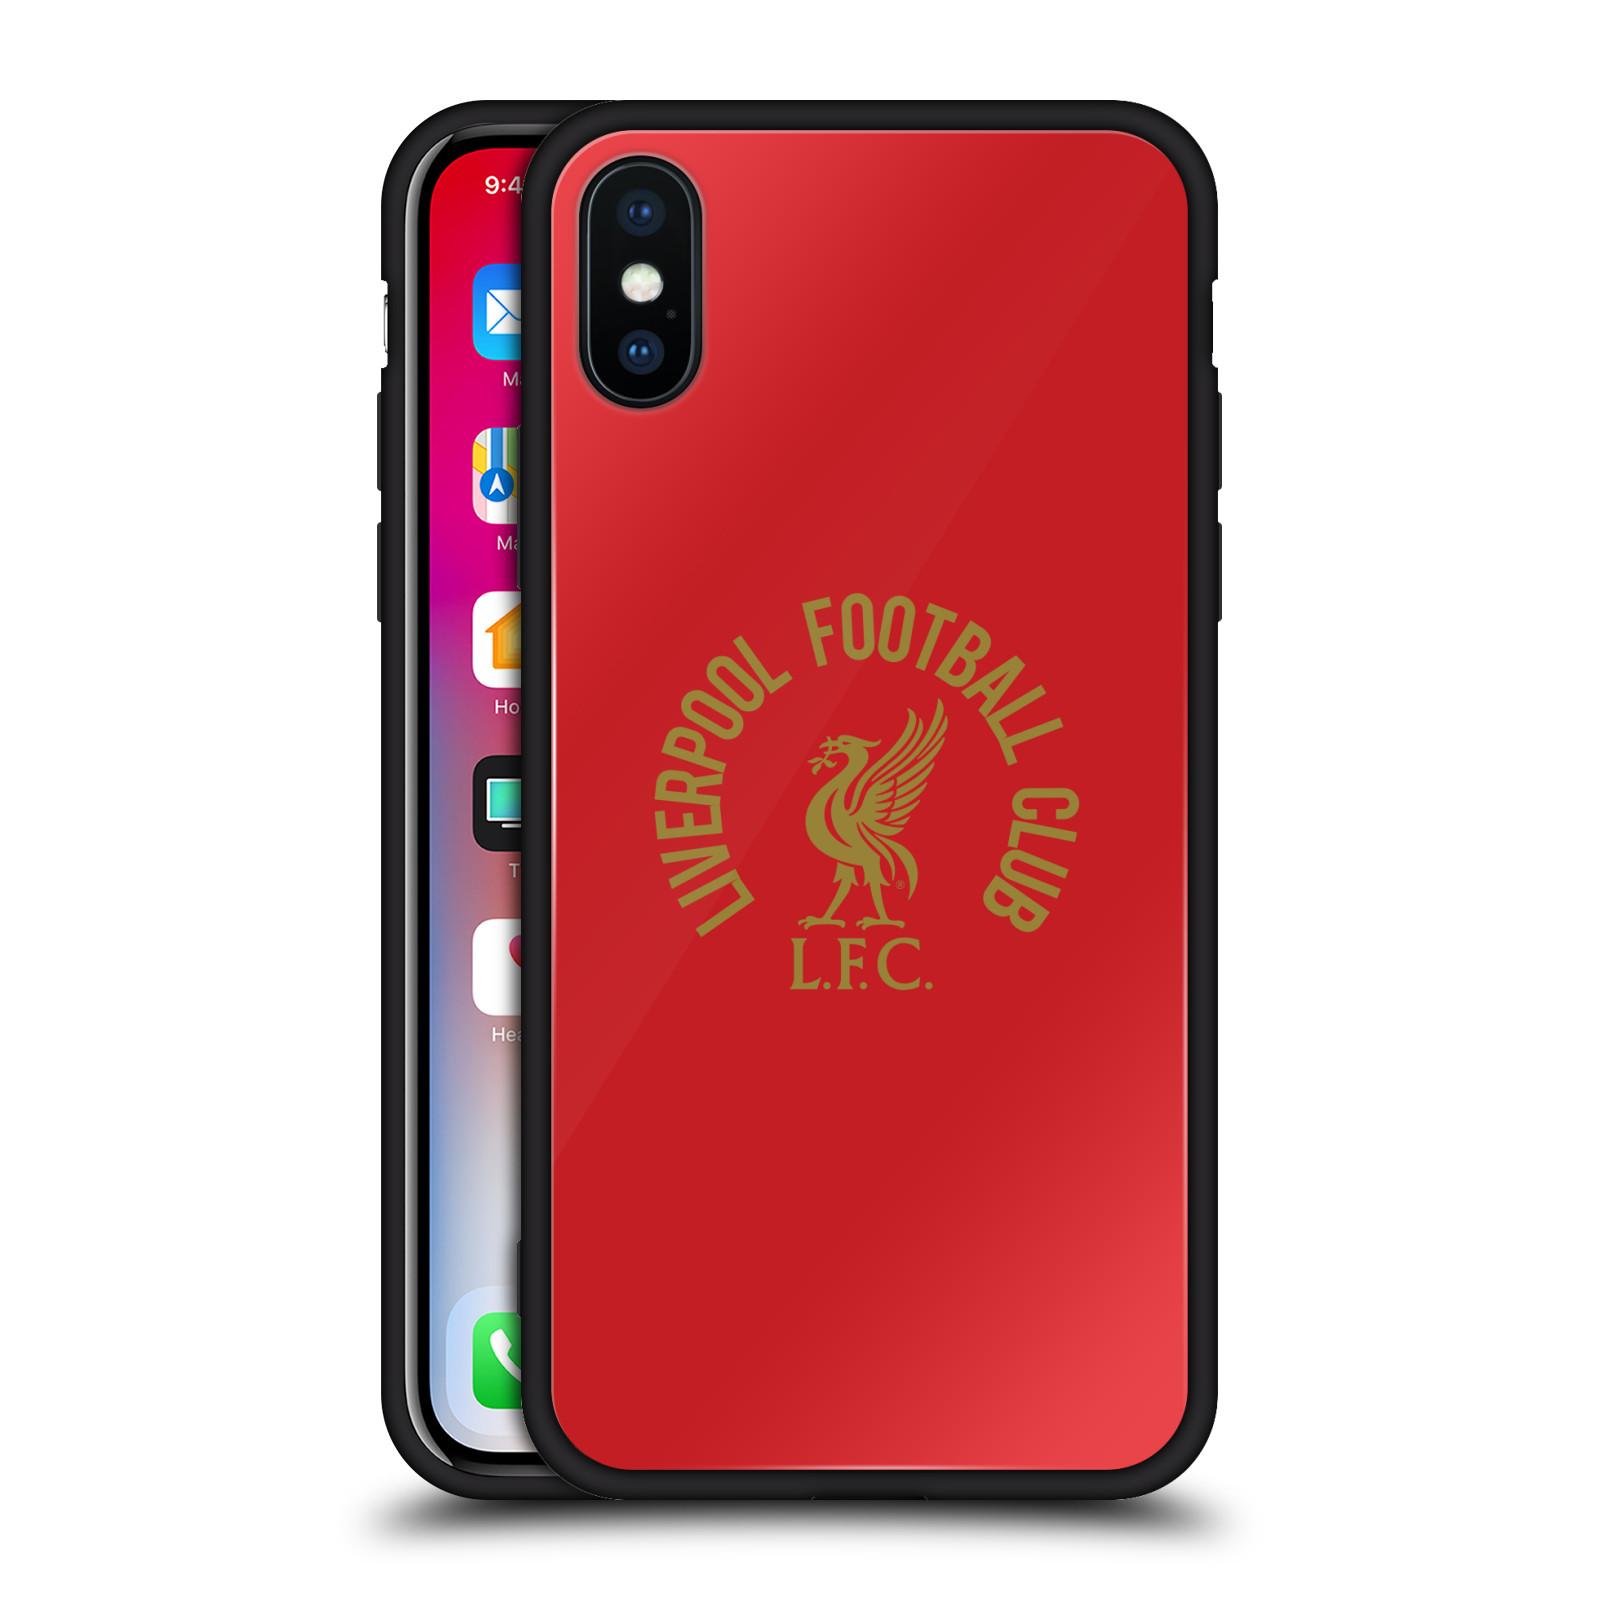 LIVERPOOL-FC-LFC-LIVER-BIRD-BLACK-HYBRID-GLASS-BACK-CASE-FOR-iPHONE-PHONES